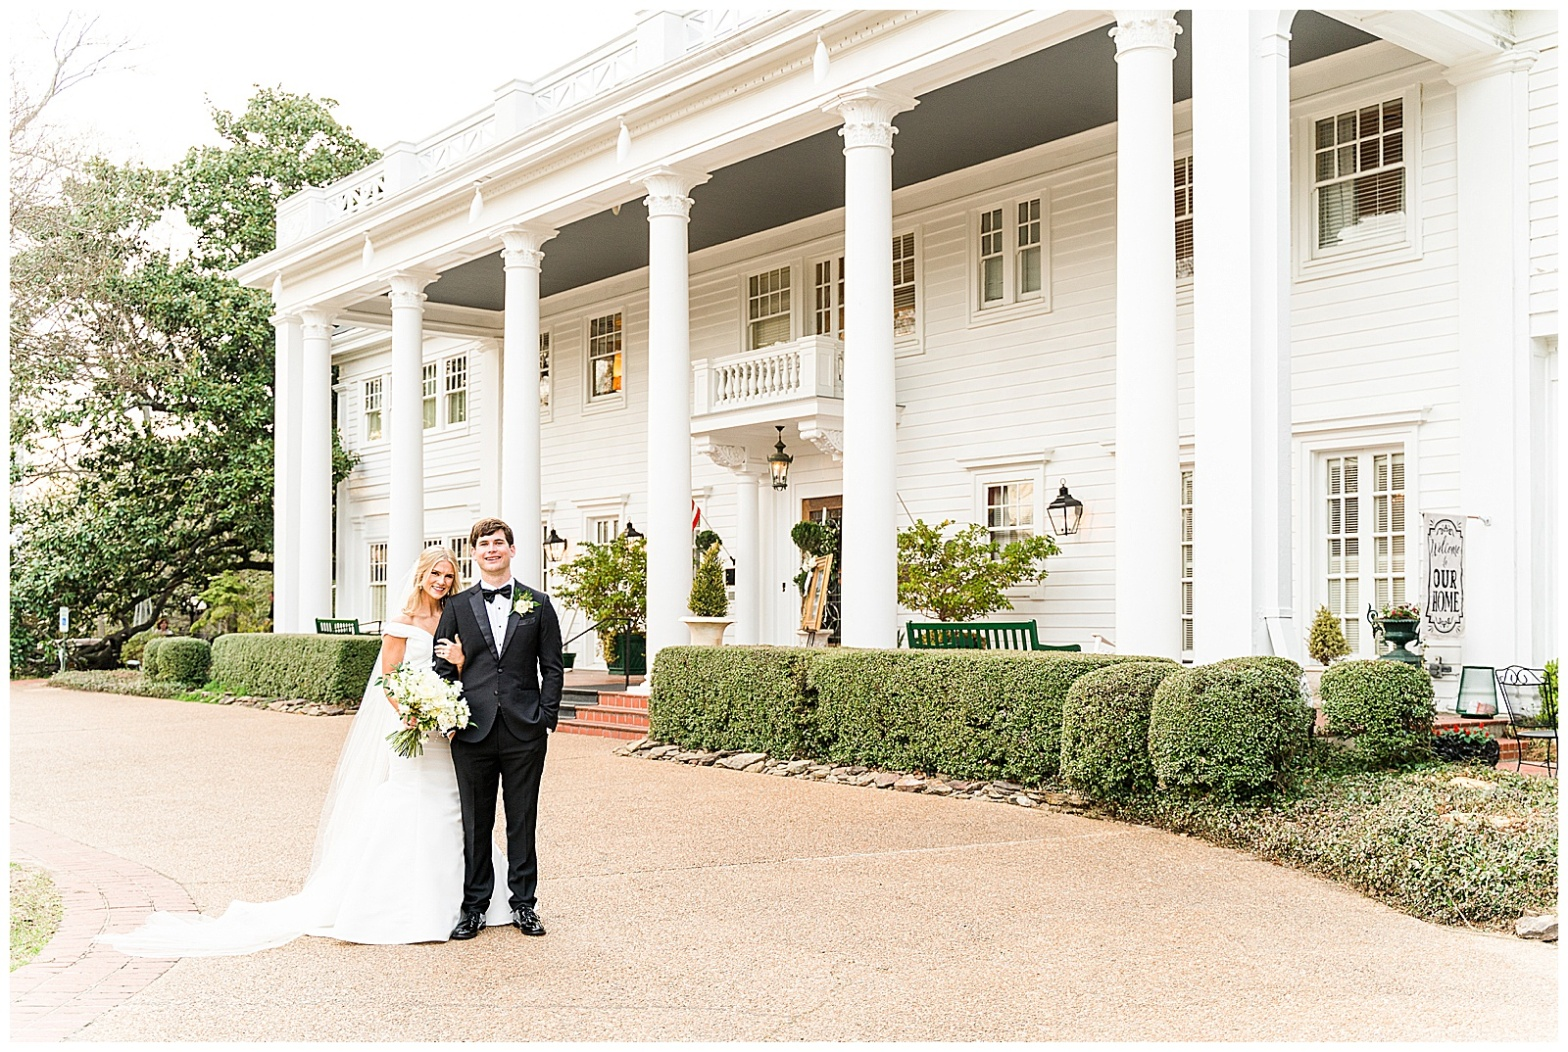 Spring Wedding at Fairview Inn